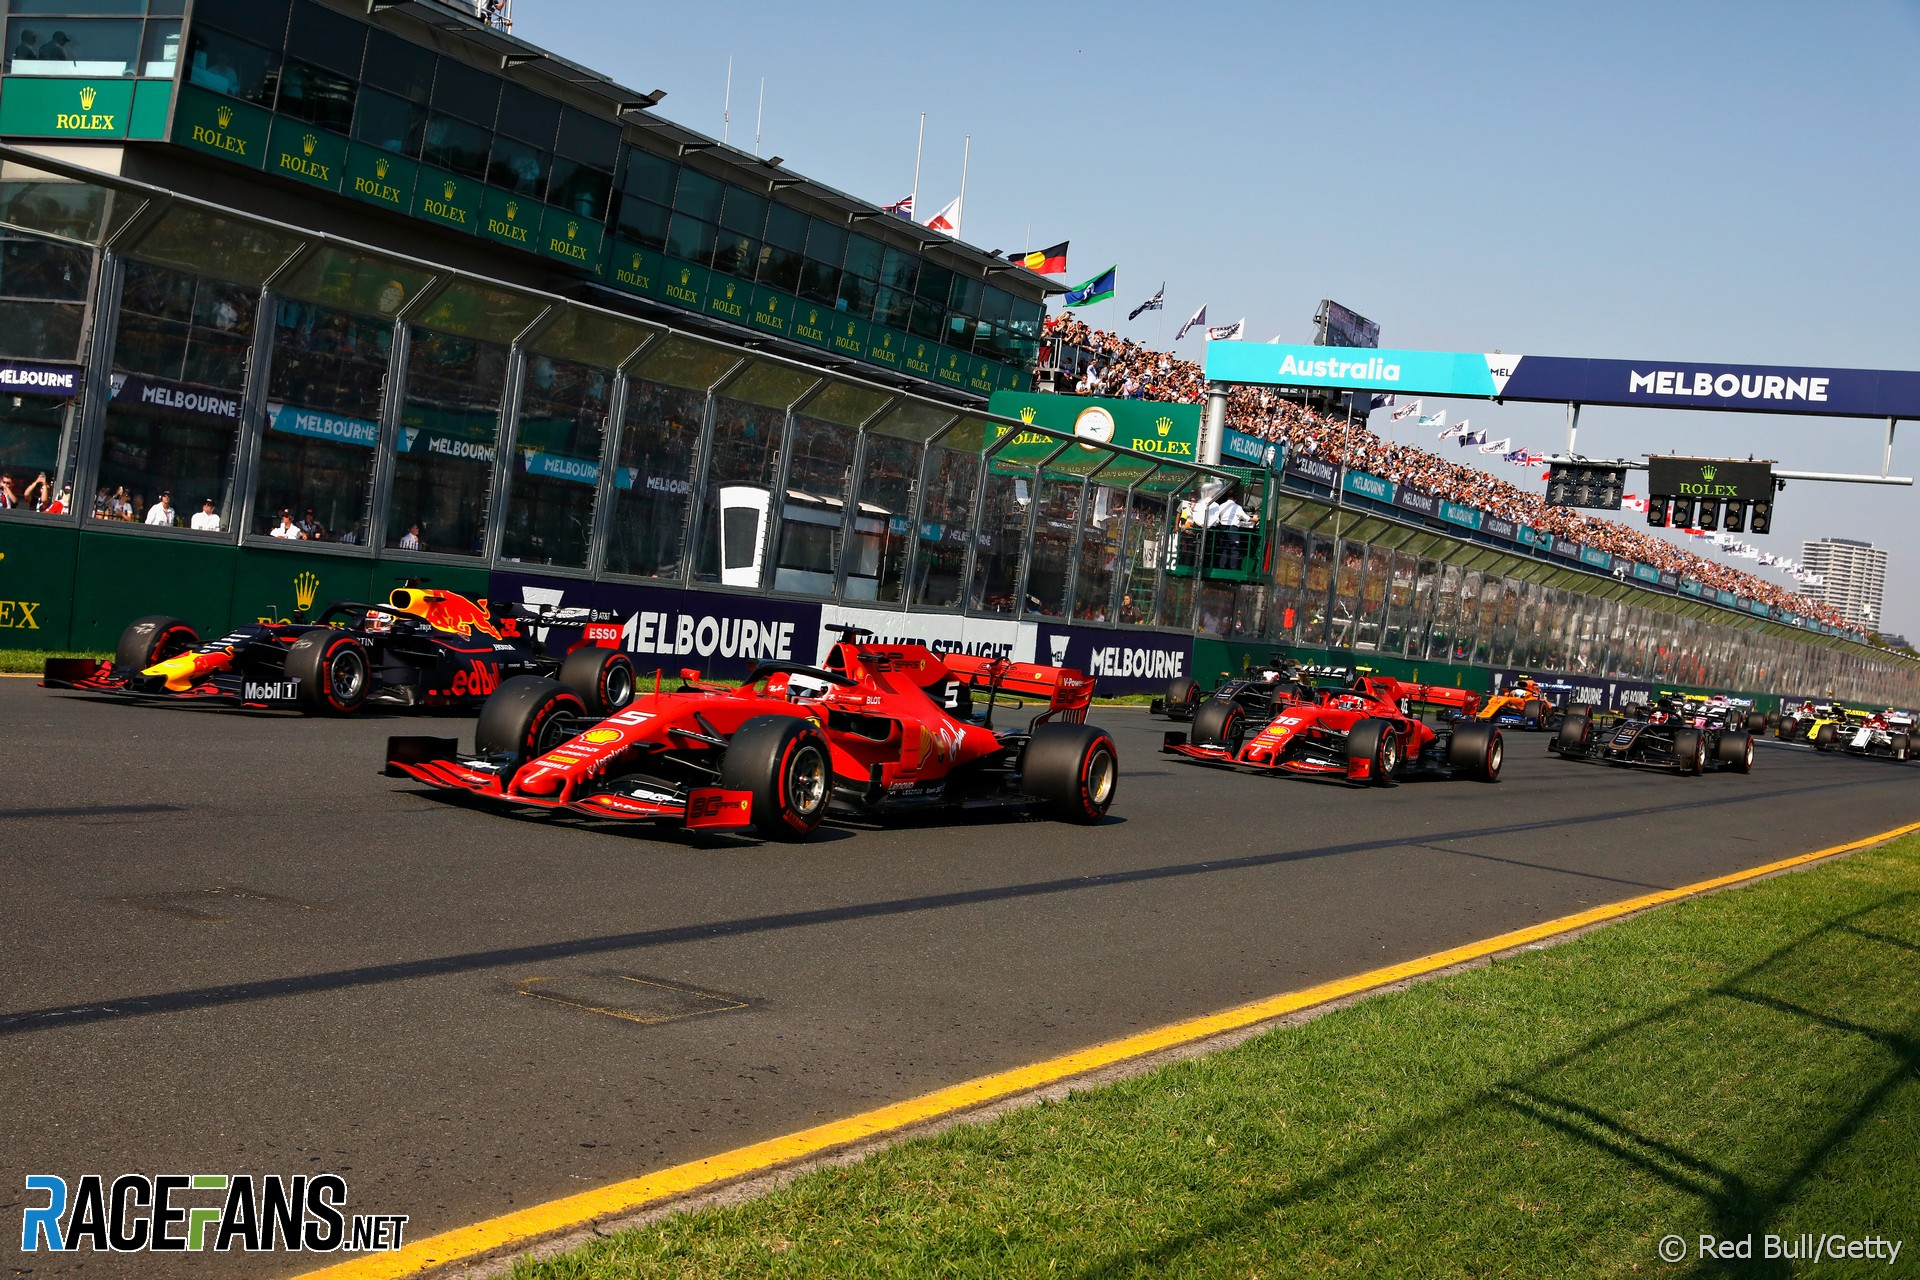 2020 F1 Calendar: Formula 1 Grand Prix Schedule Details - Racefans